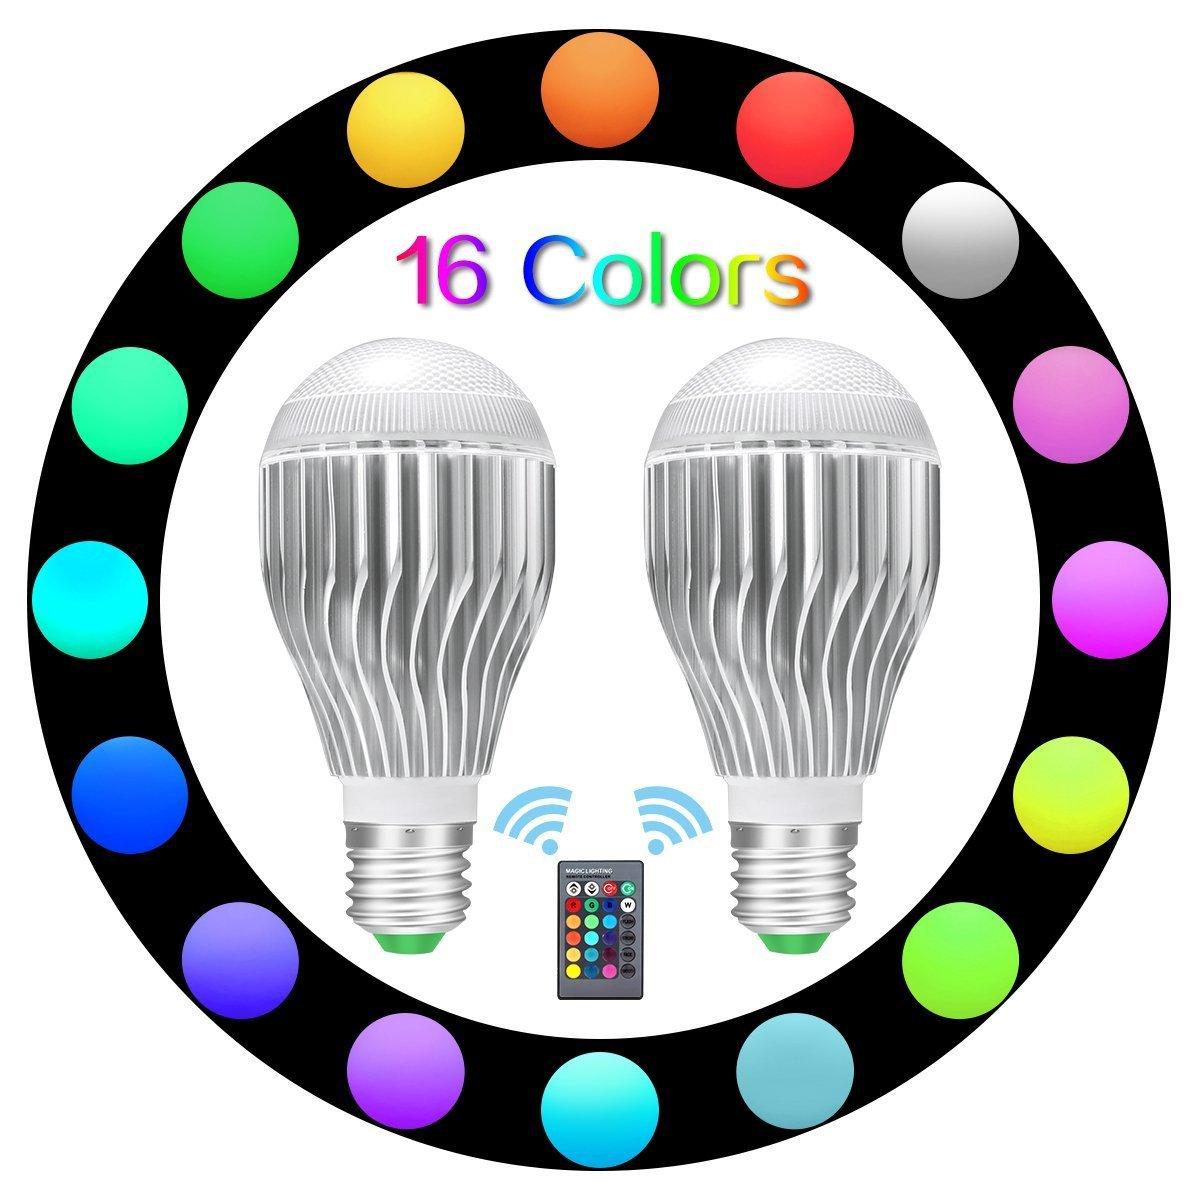 tenlion e26 LEDライト電球、10 W RGB調光機能付きLEDライトの色変更電球withリモートコントローラの装飾照明、ムード照明など。 – パックof 2 B07DWWXPGX